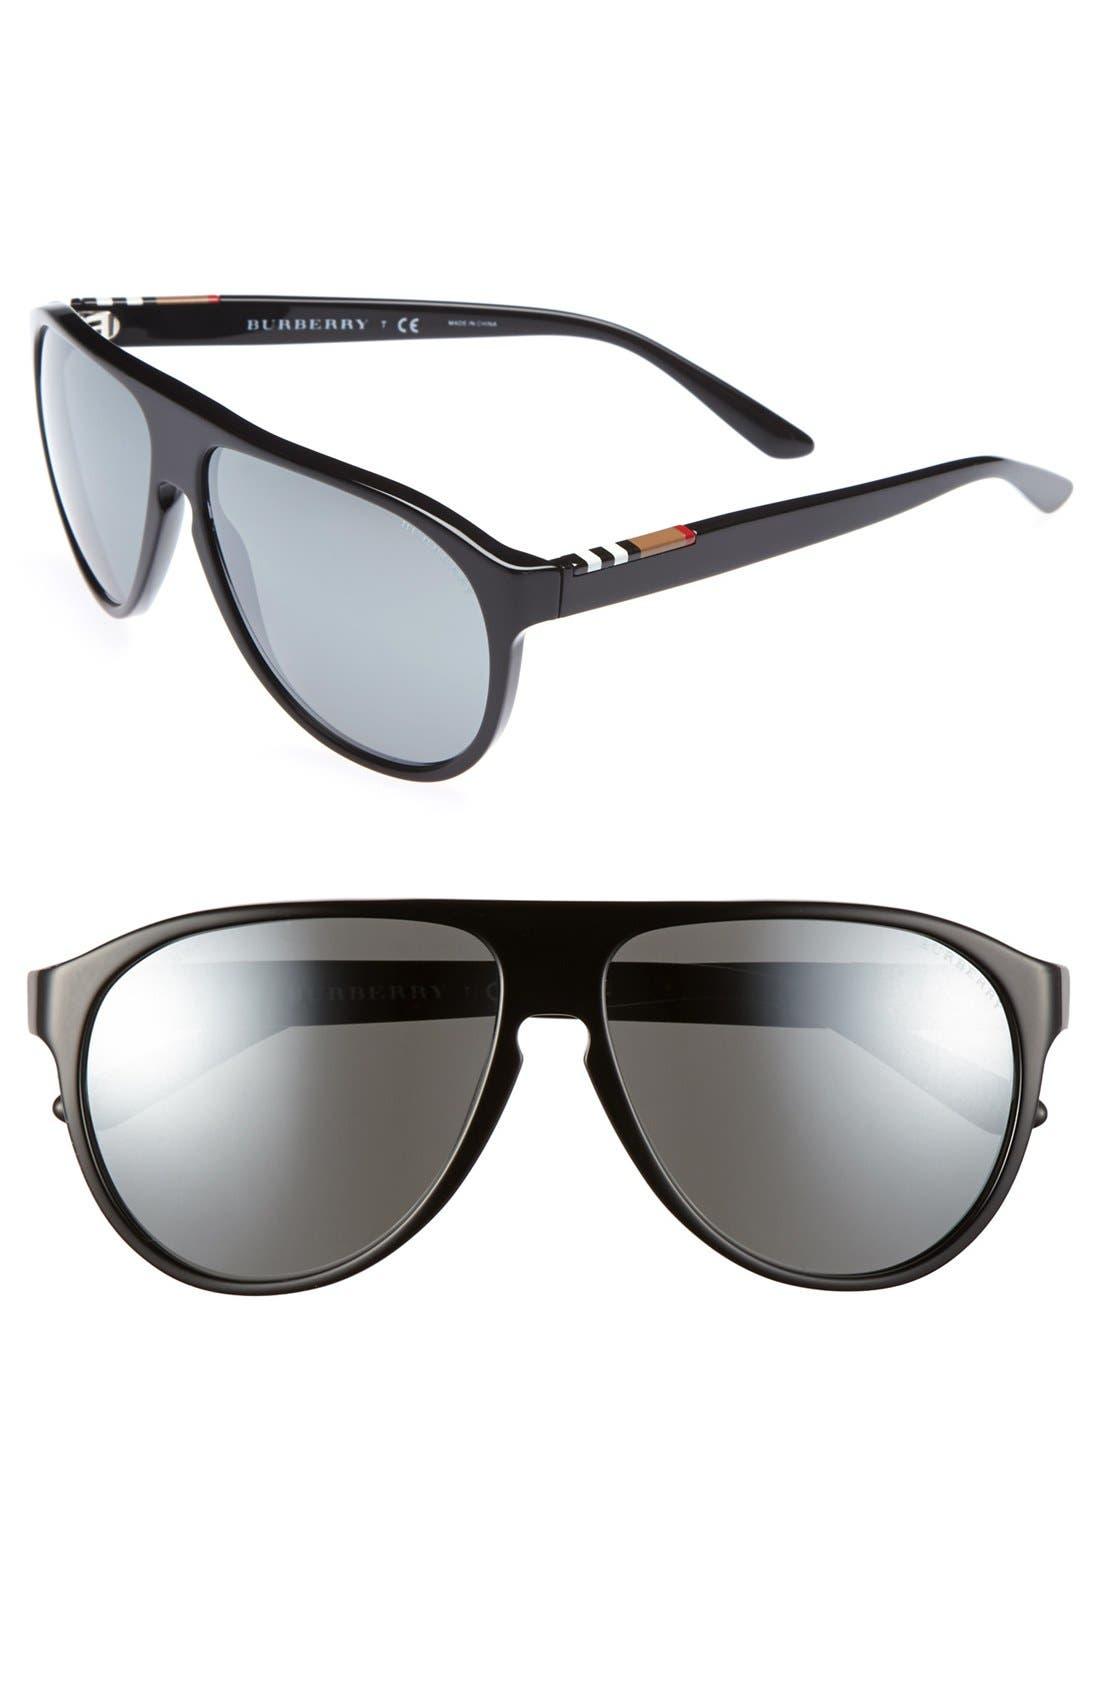 Main Image - Burberry 59mm Keyhole Sunglasses